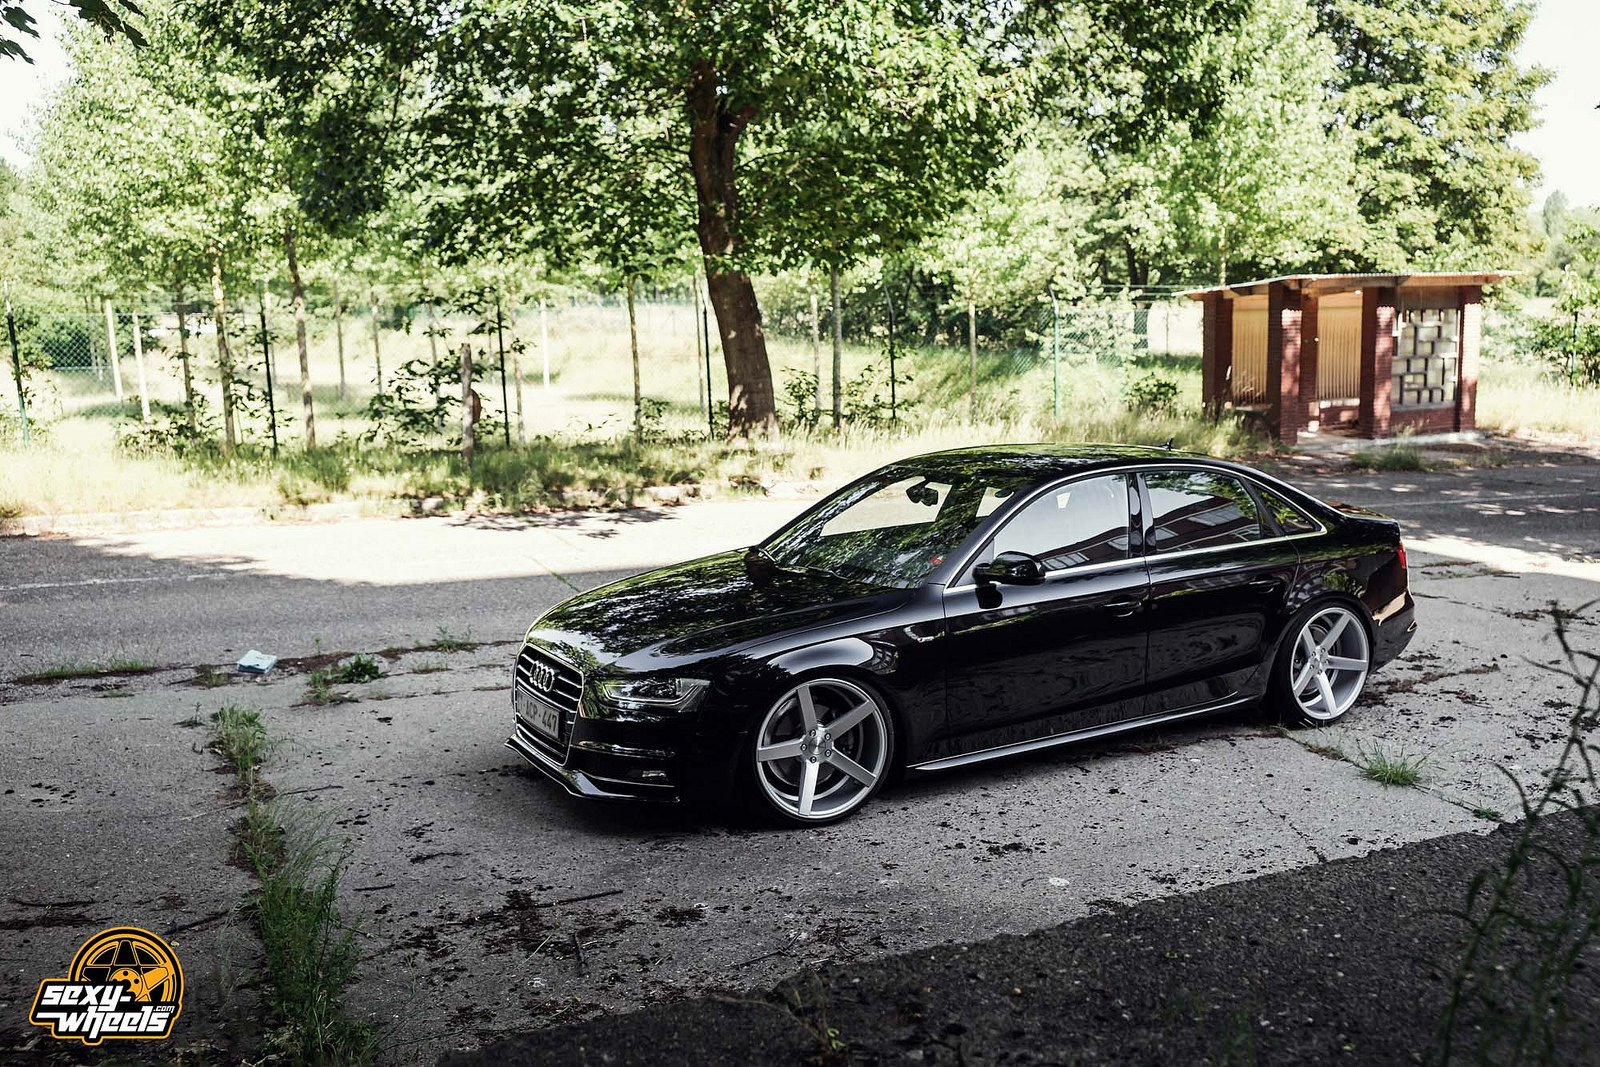 Cars Vossen Tuning Wheels Audi A4 Sedan Black Wallpaper